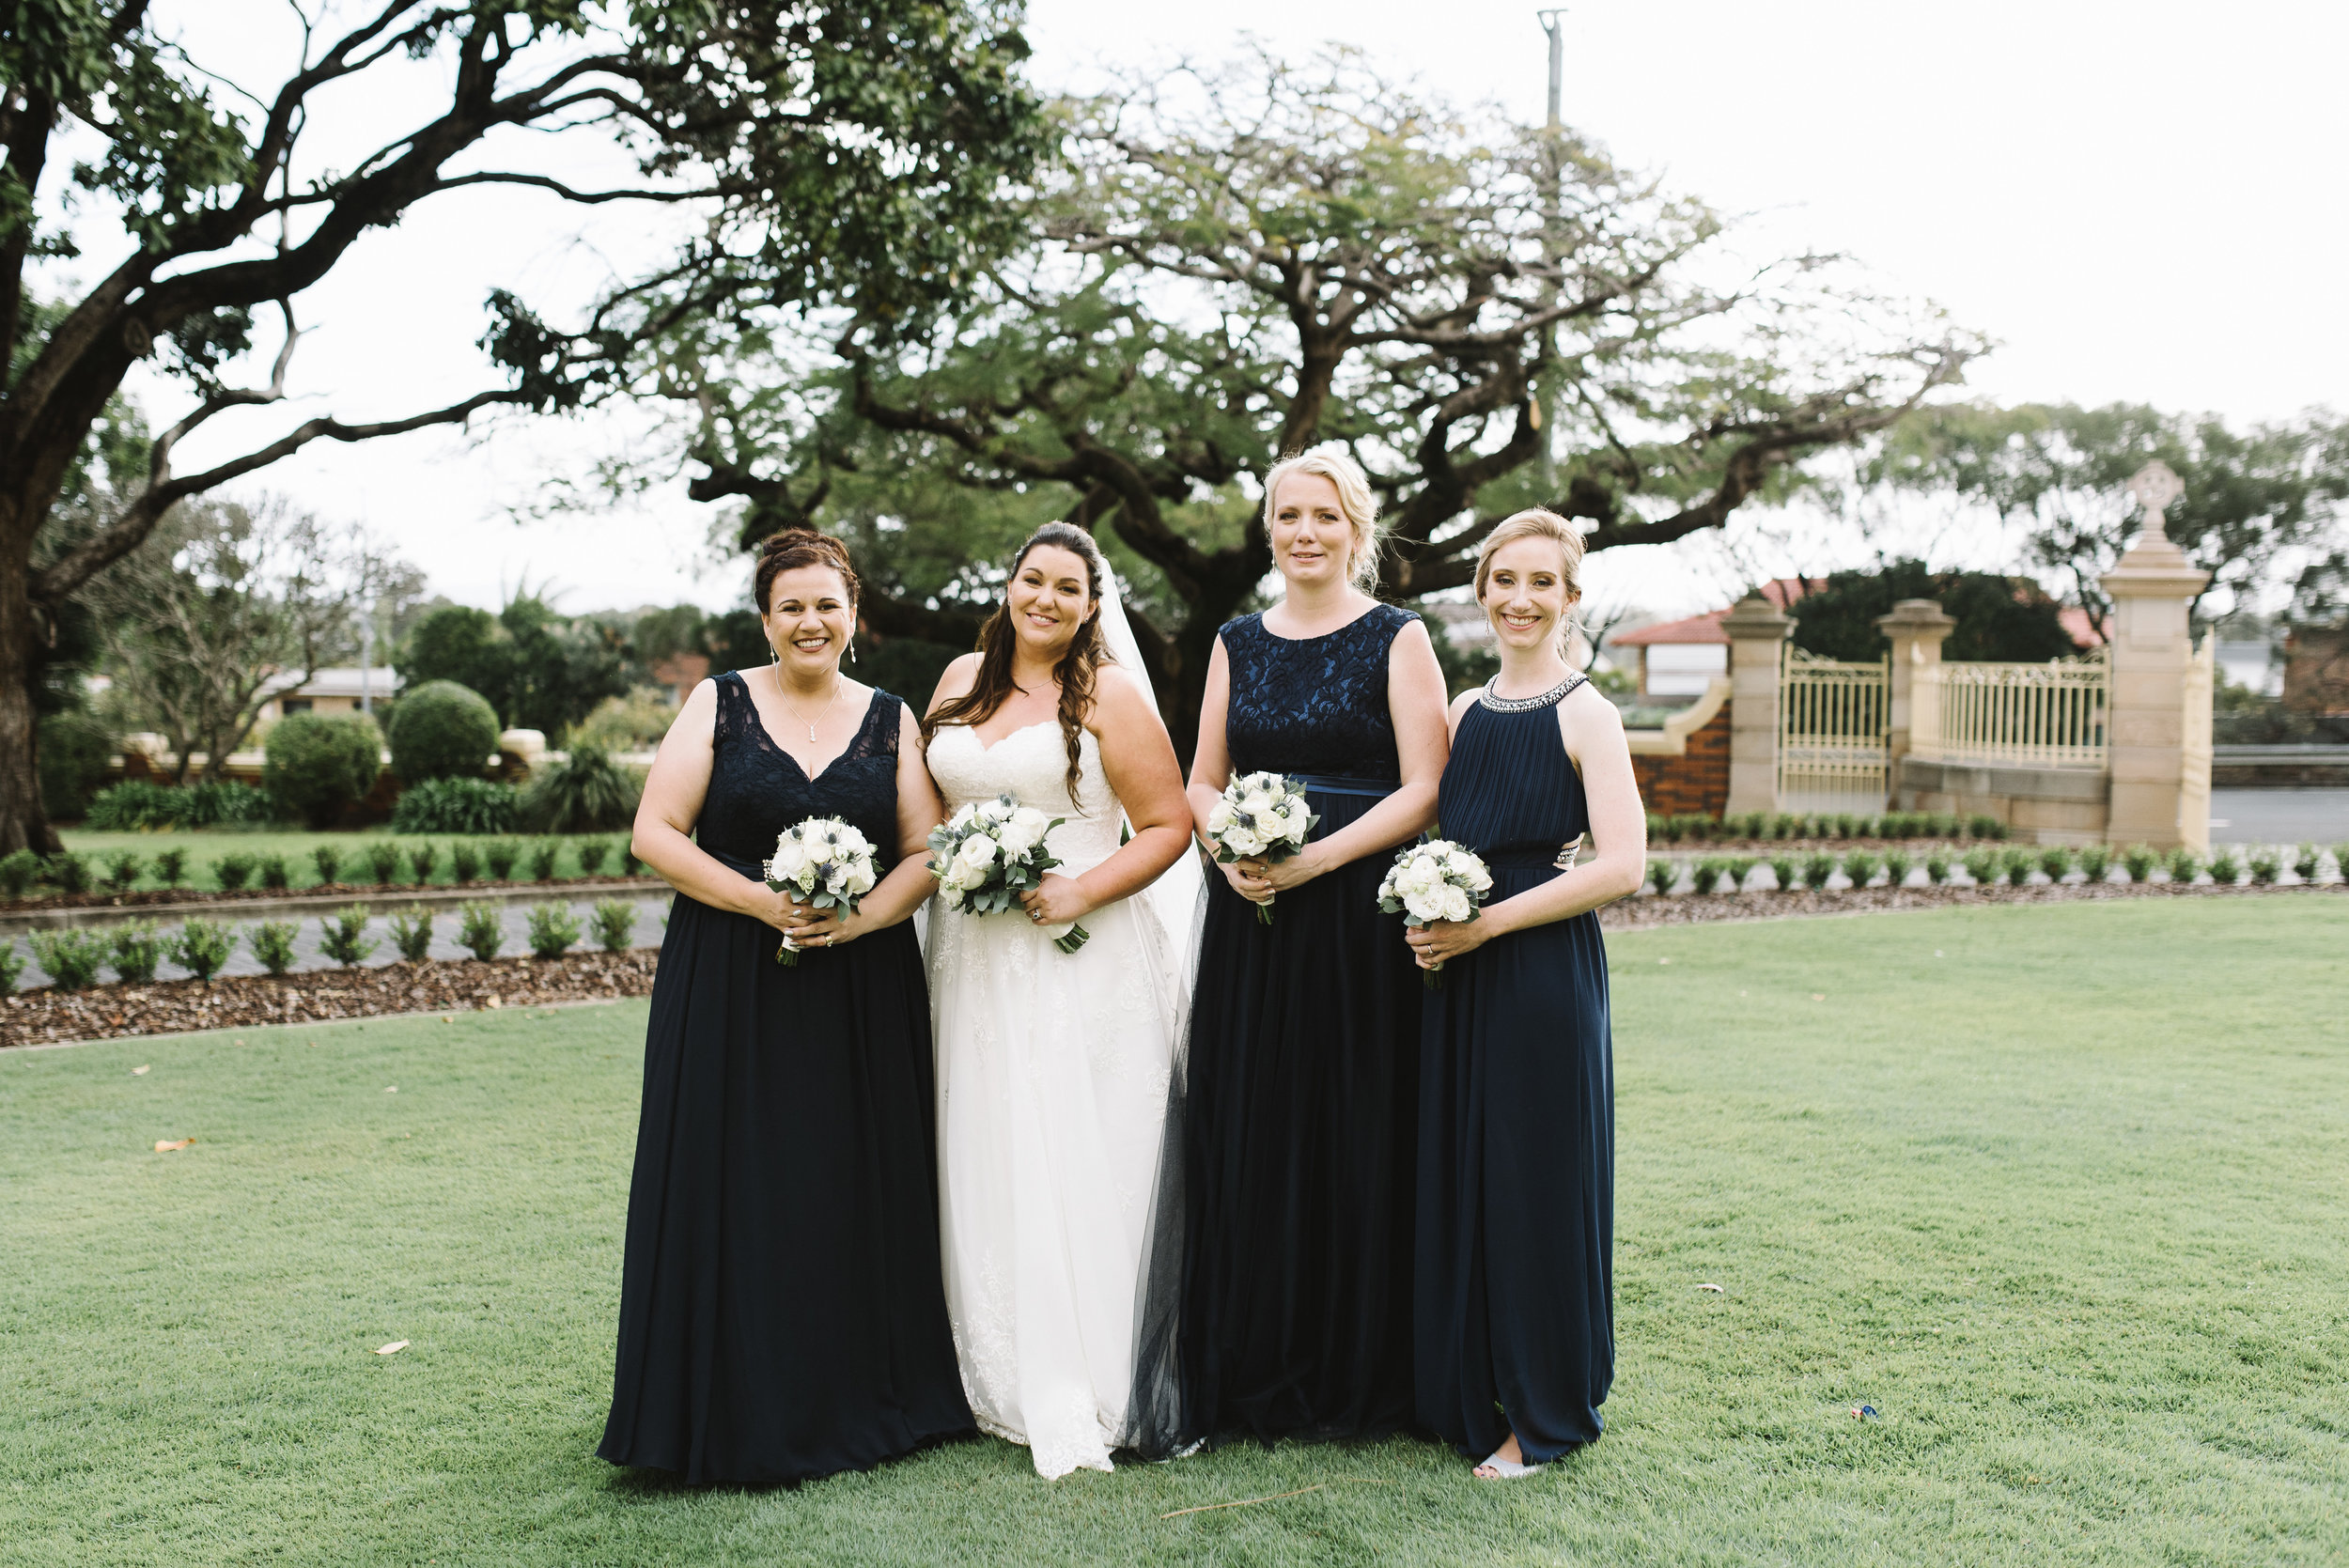 brisbane-wedding-photographer-69.jpg